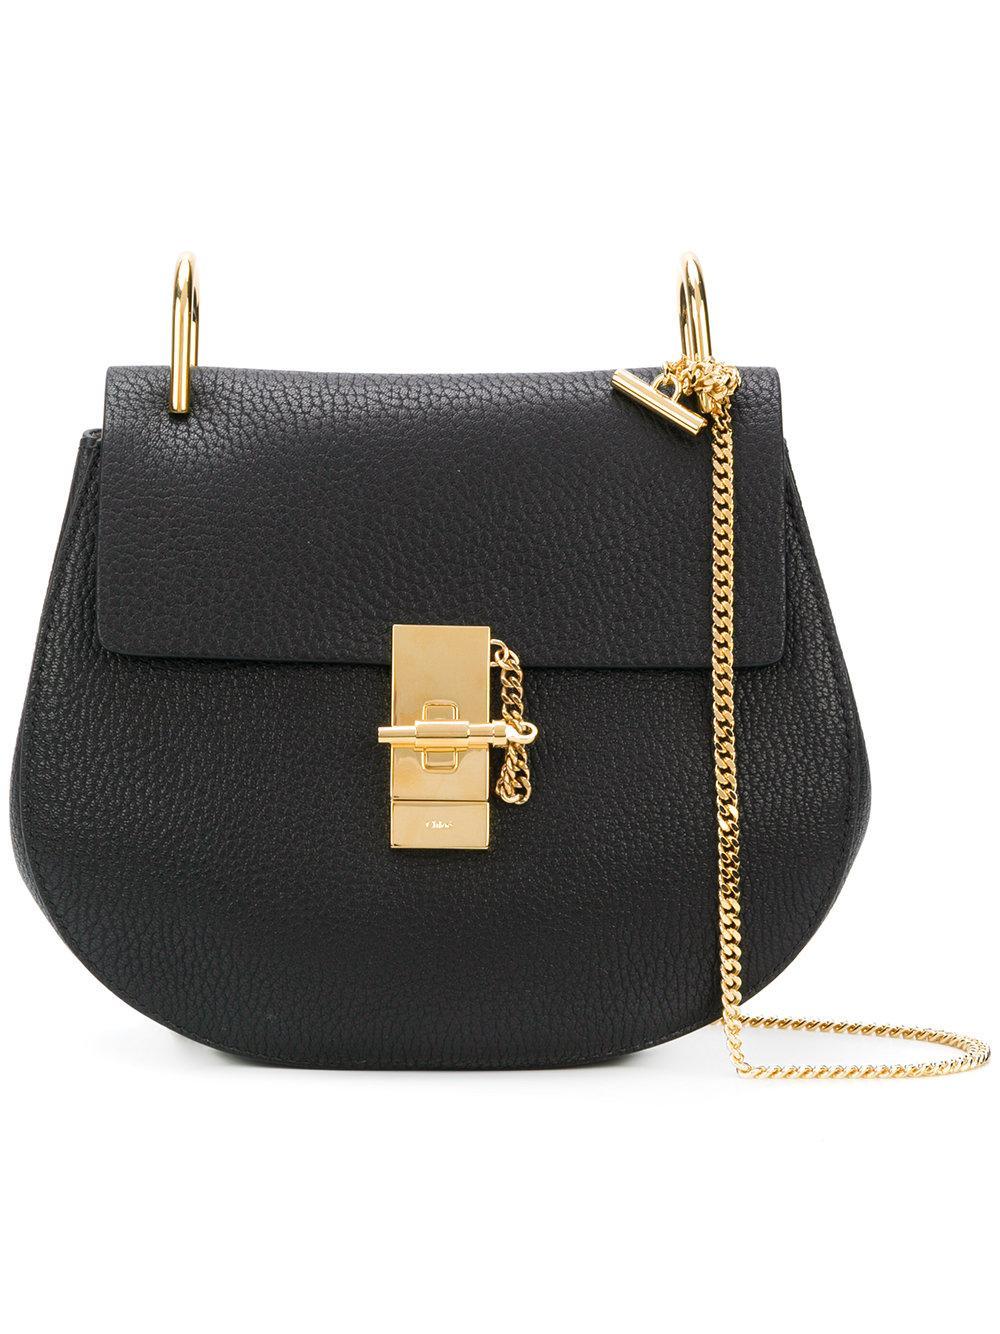 8cf62c88ef ChloÉ Drew Small Textured-Leather Shoulder Bag In Black